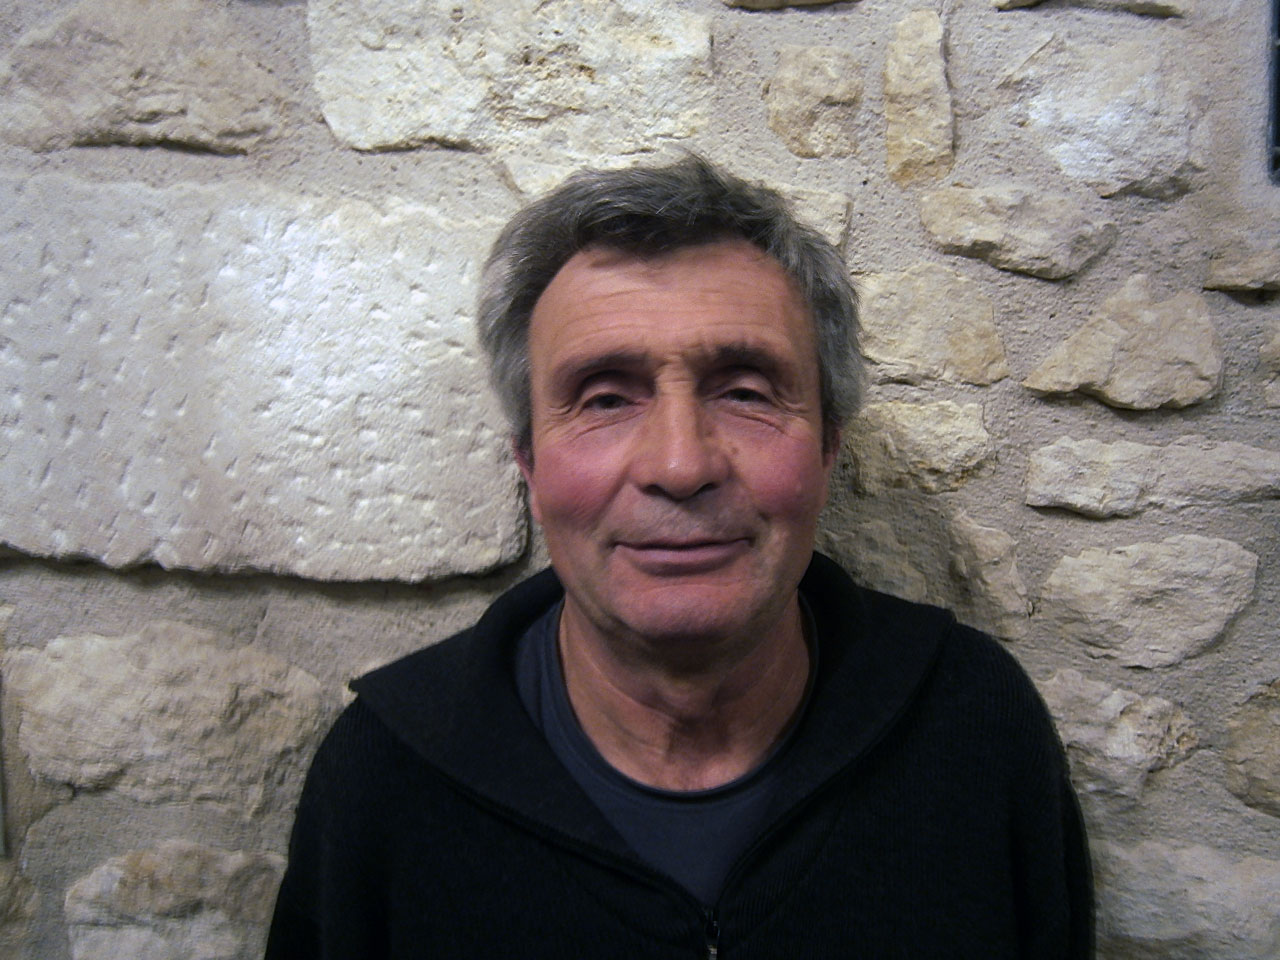 GACHON Didier